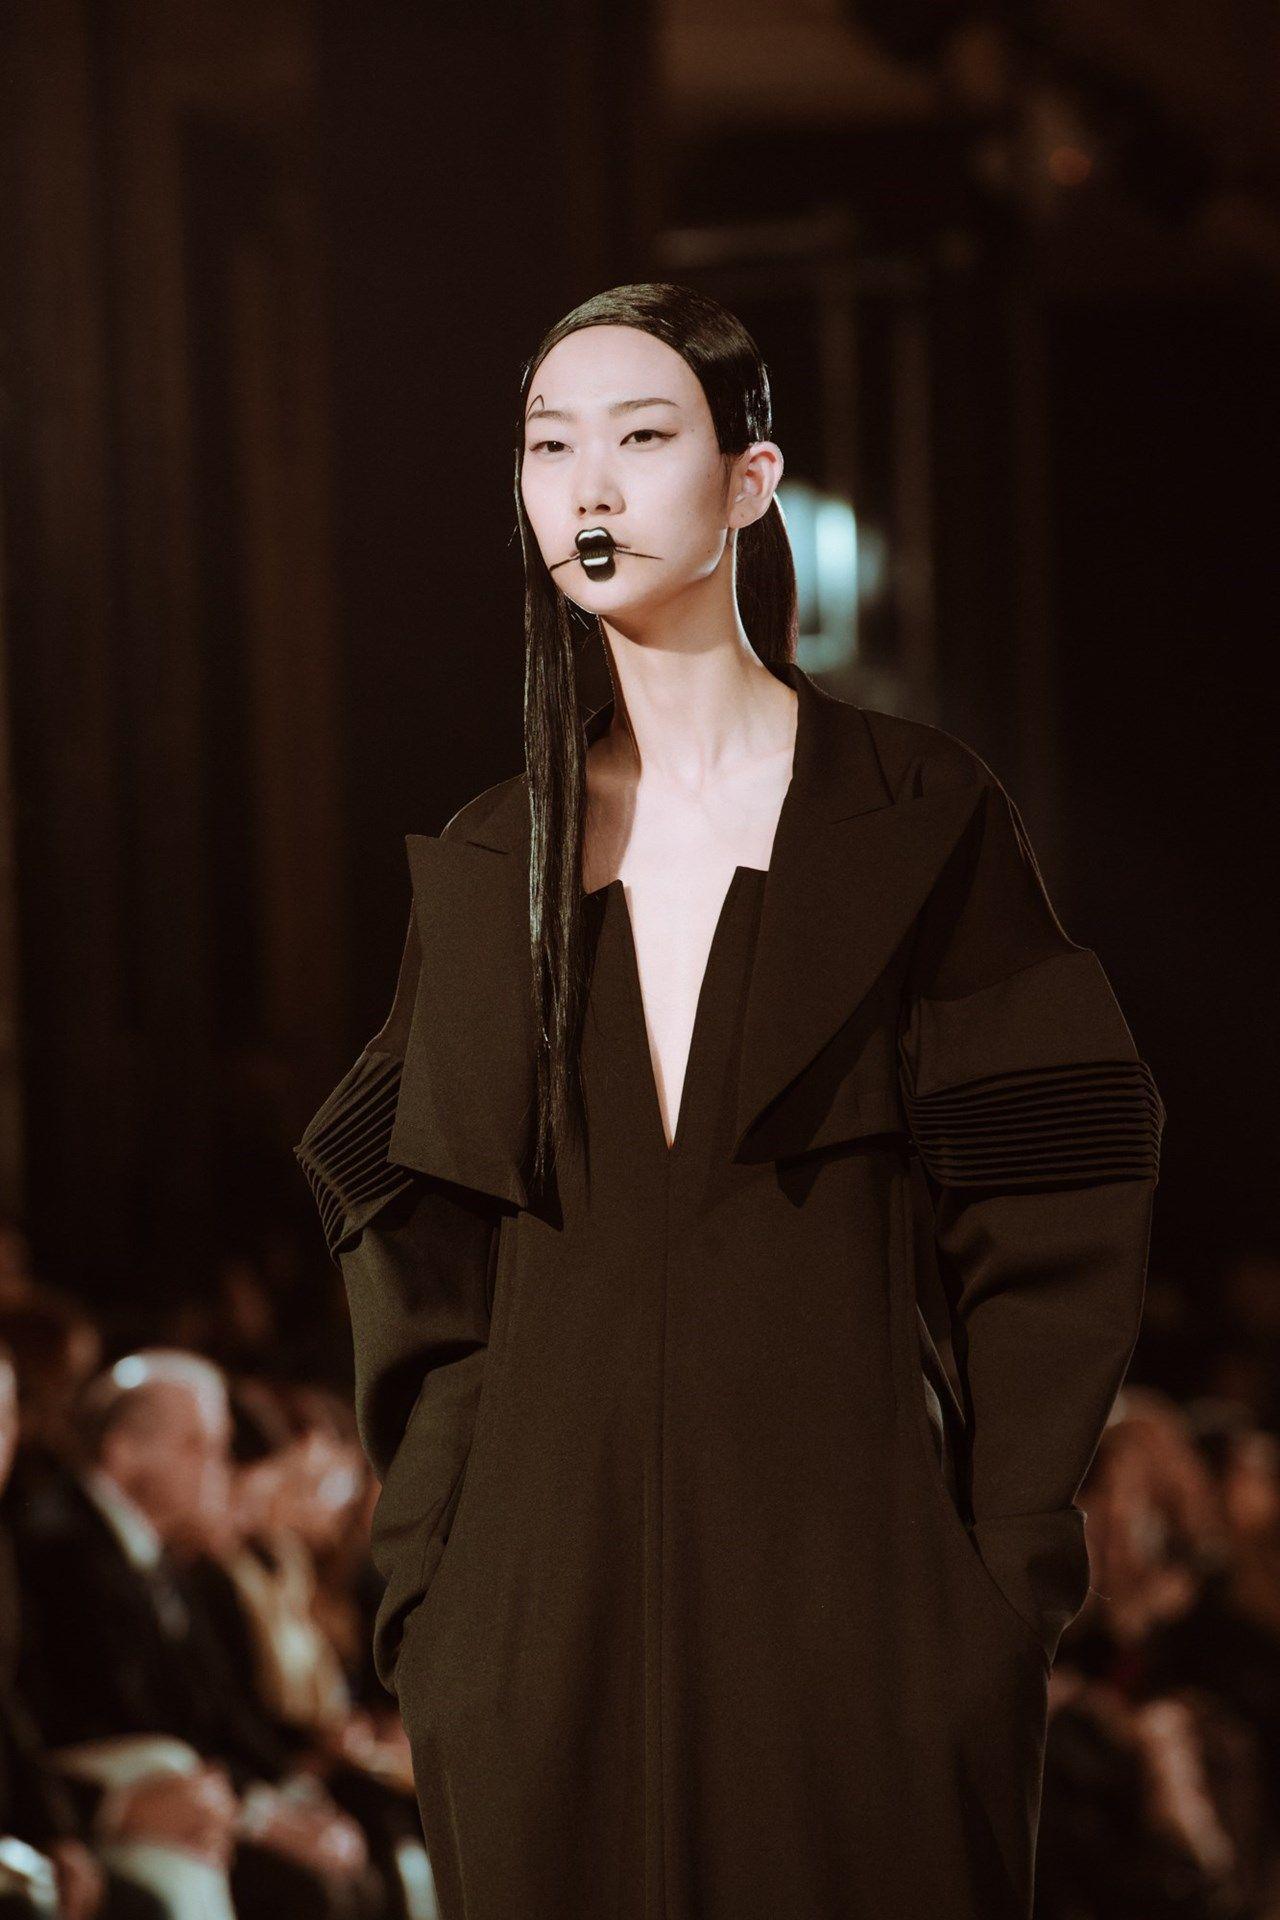 Yohji Yamamoto Aw16 Yohji Yamamoto Yamamoto Japanese Fashion Designers